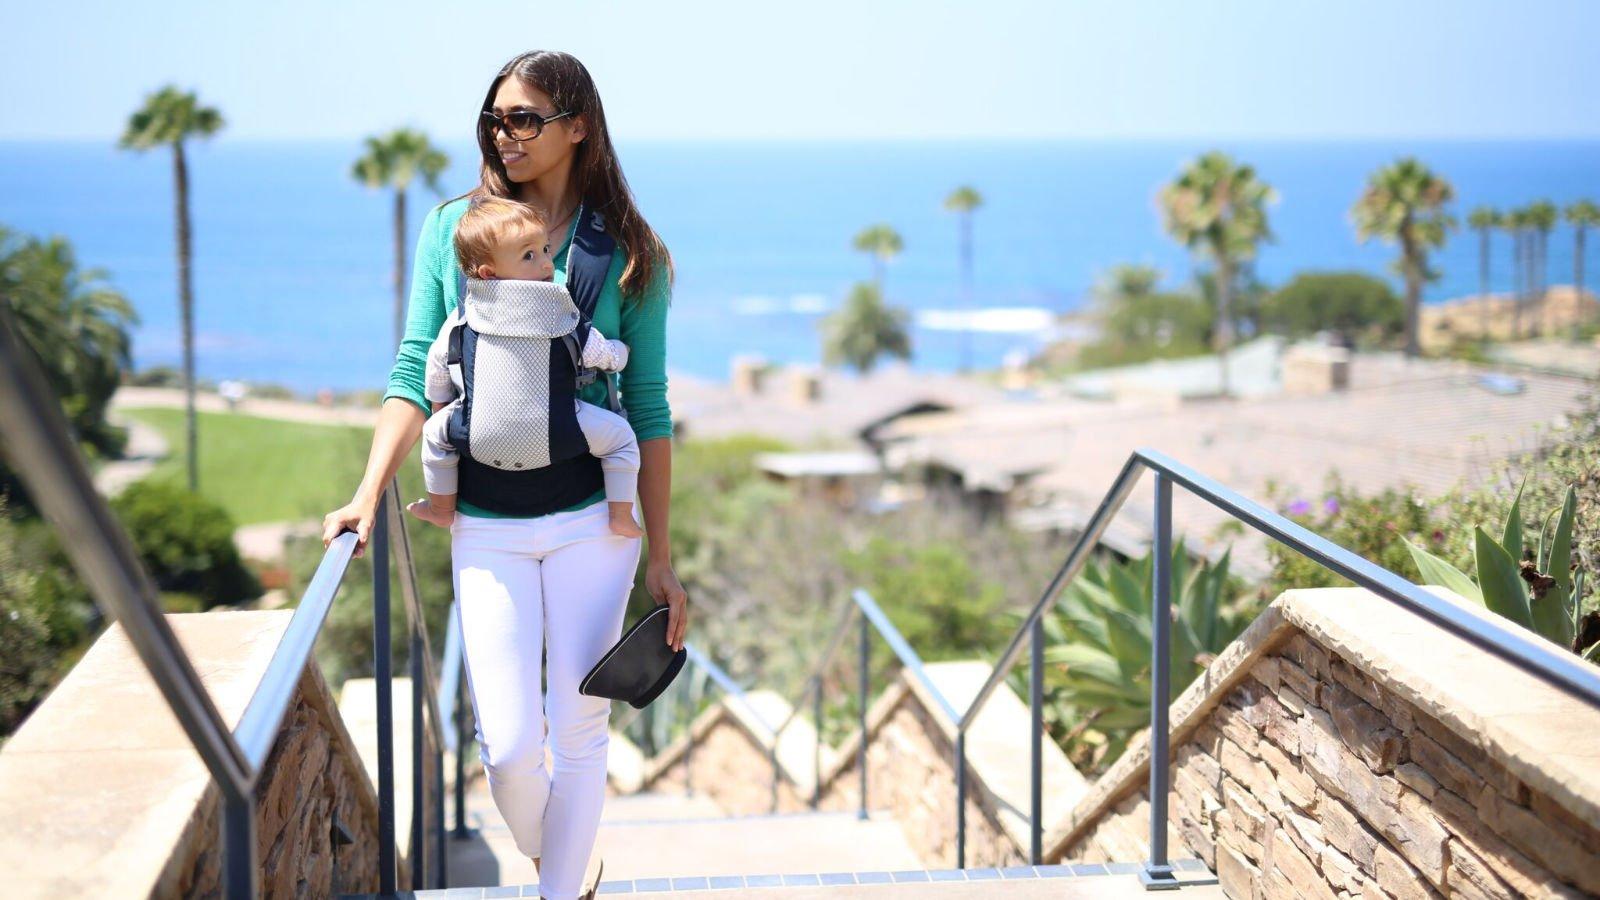 beco gemini cool baby carrier review uk ergonomic newborn baby sling